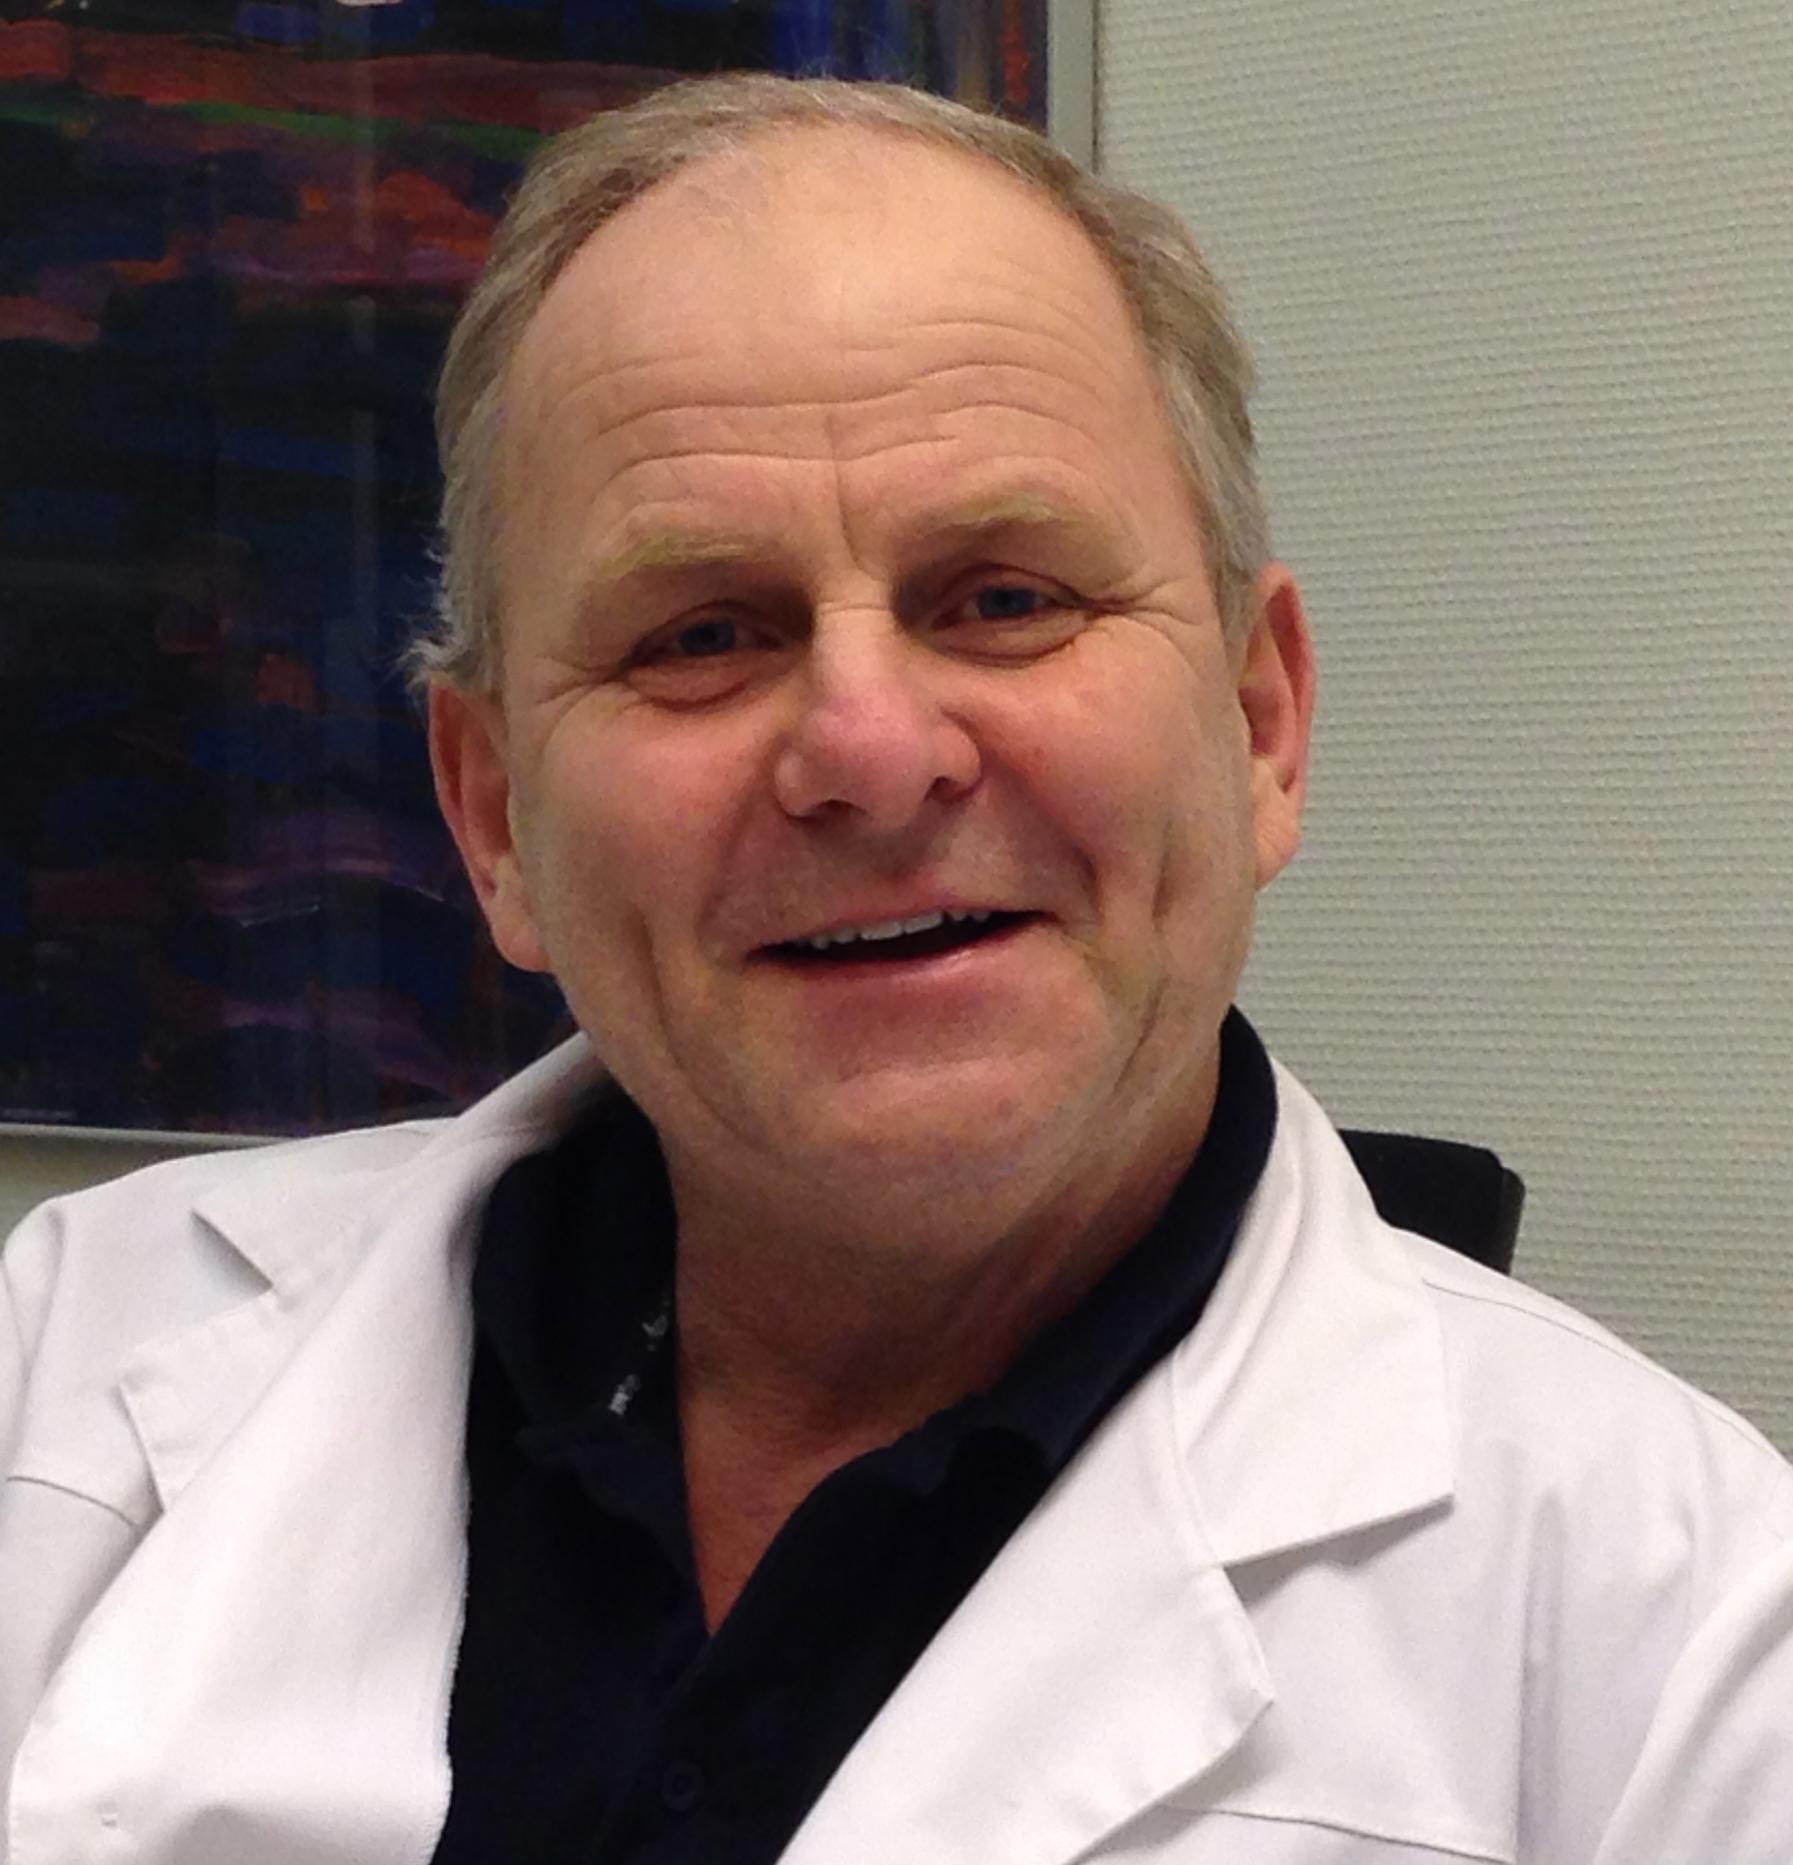 läkare neurologi göteborg